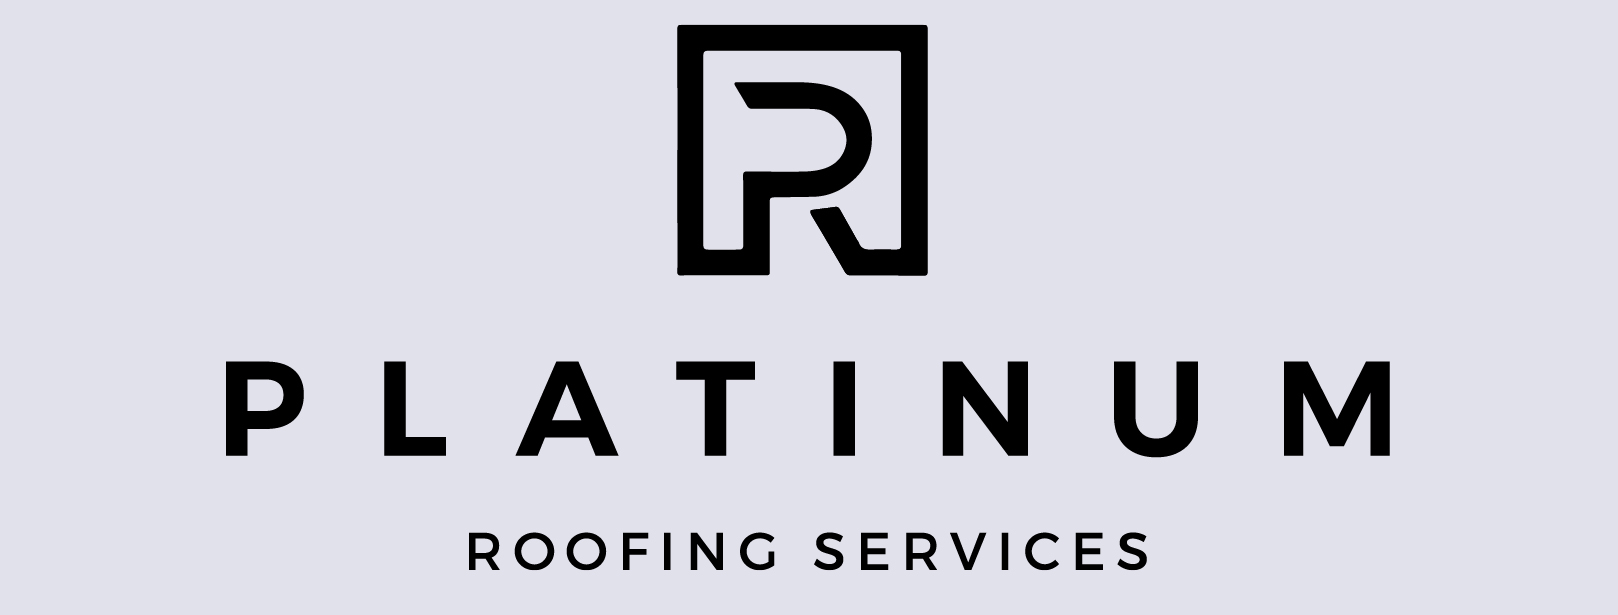 Platinum Roofing Services